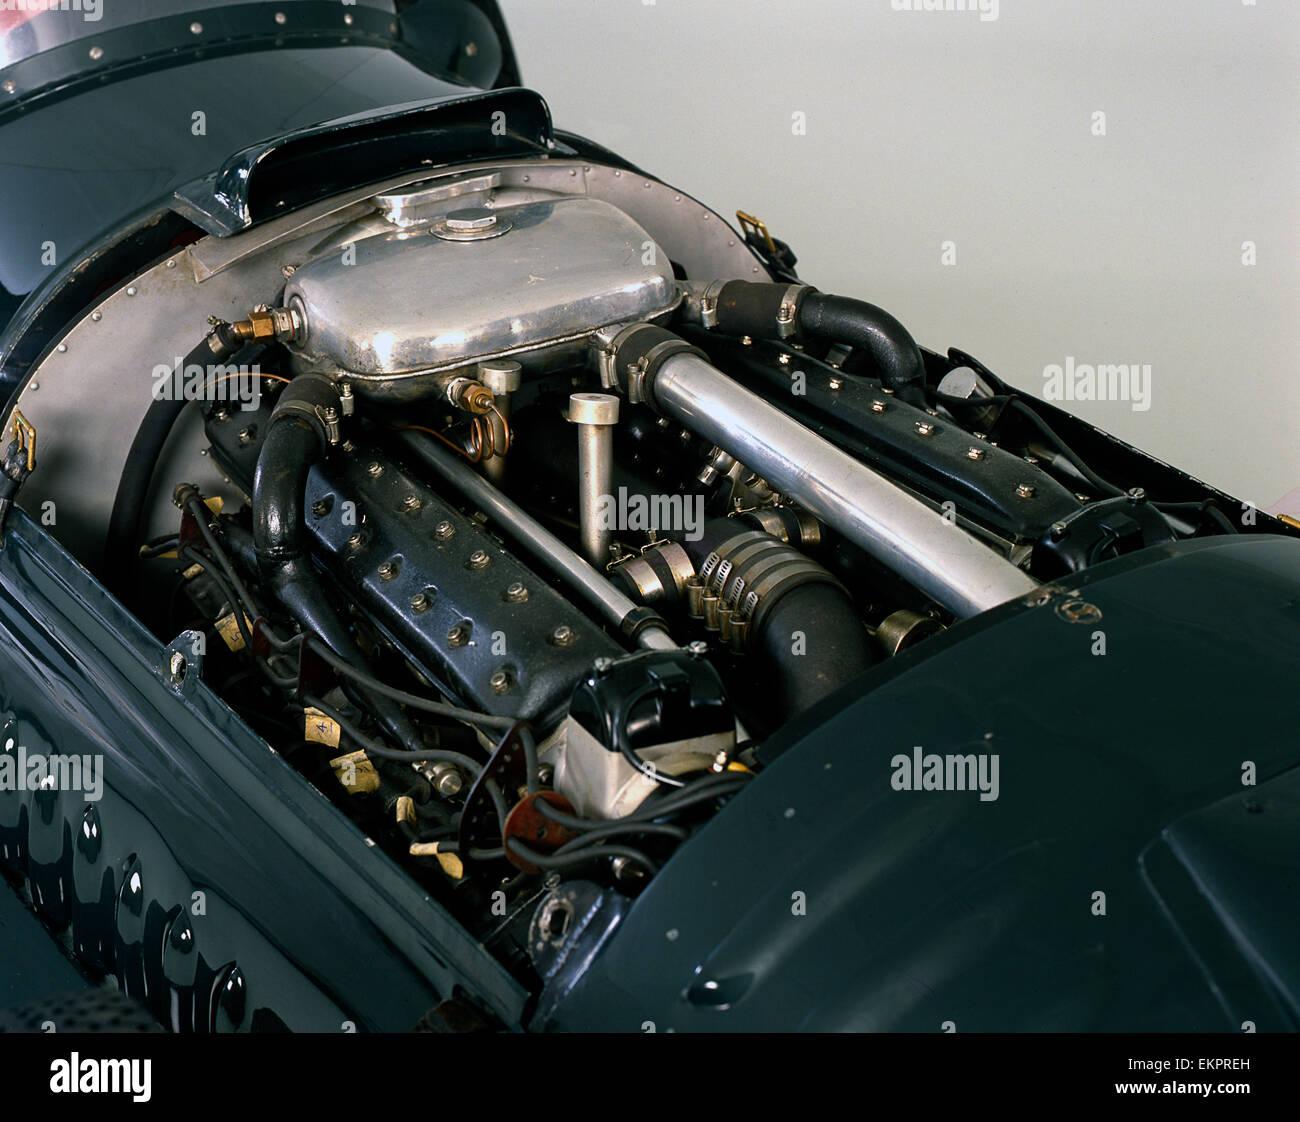 1950 BRM V16 engine - Stock Image